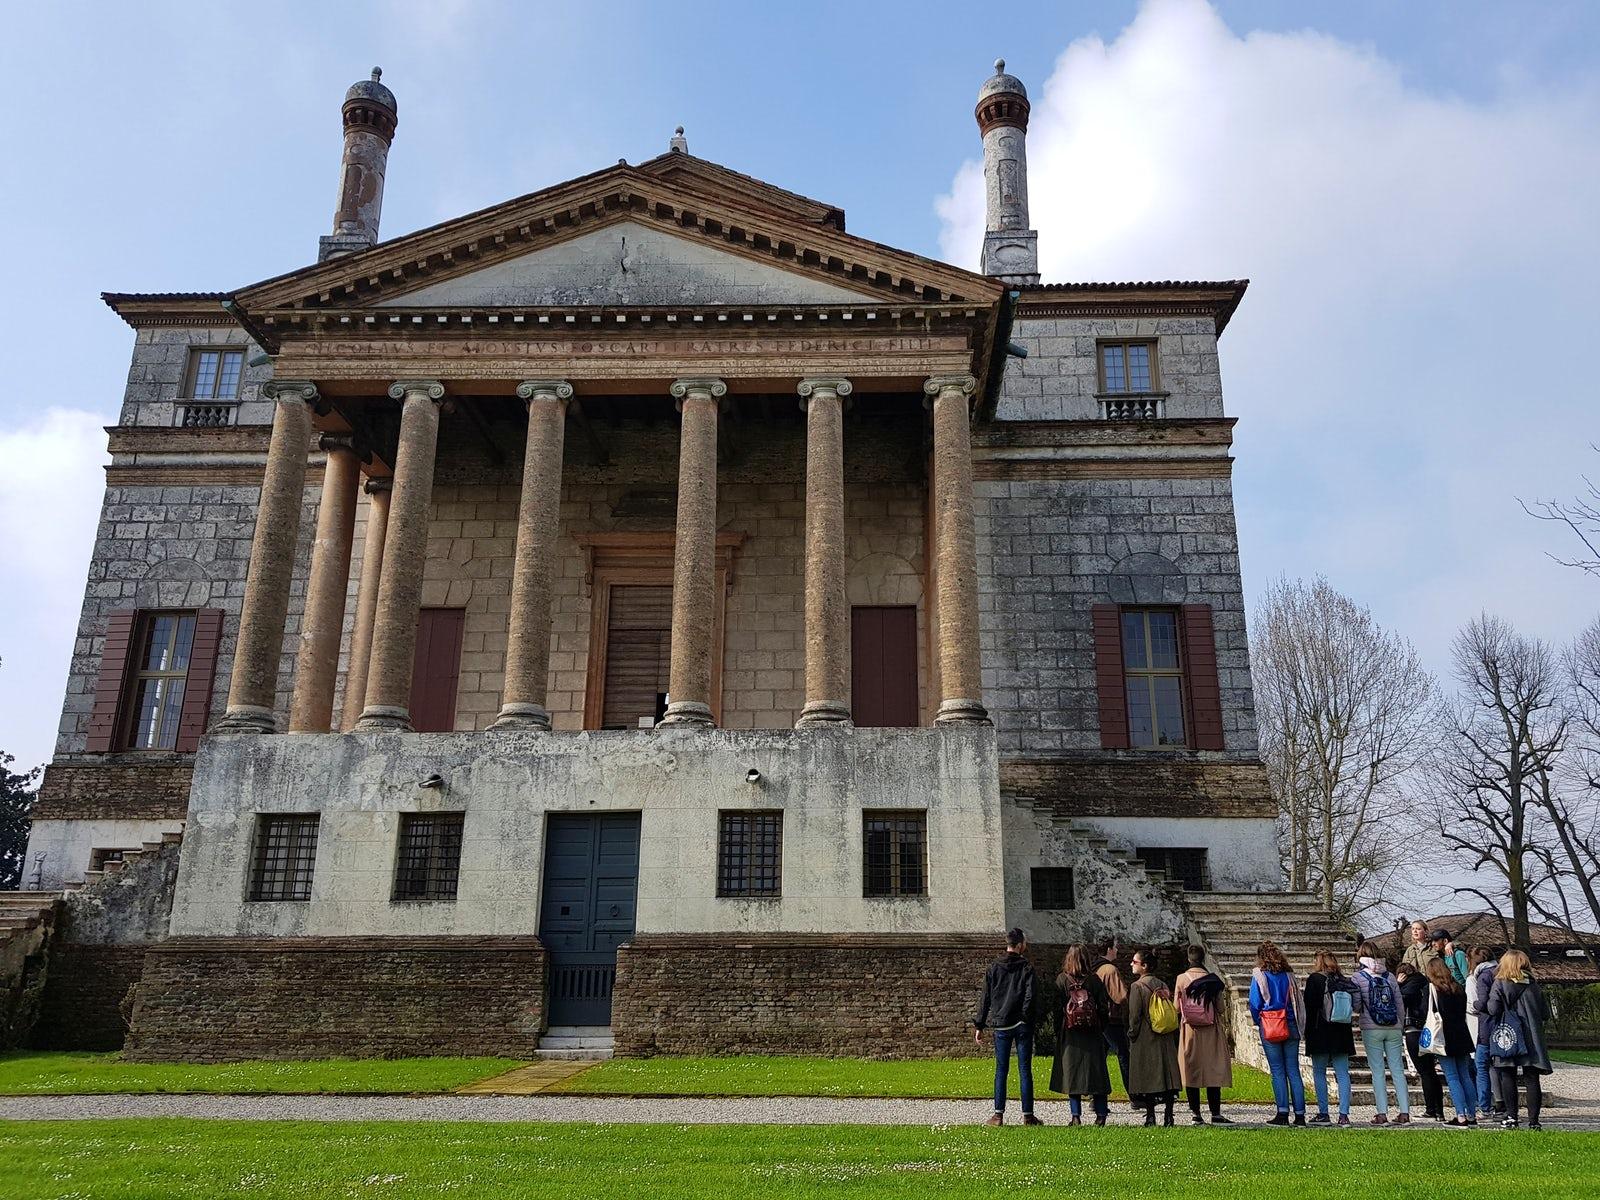 Visita guidata Villa Foscari la malcontenta sulla riviera del Brenta